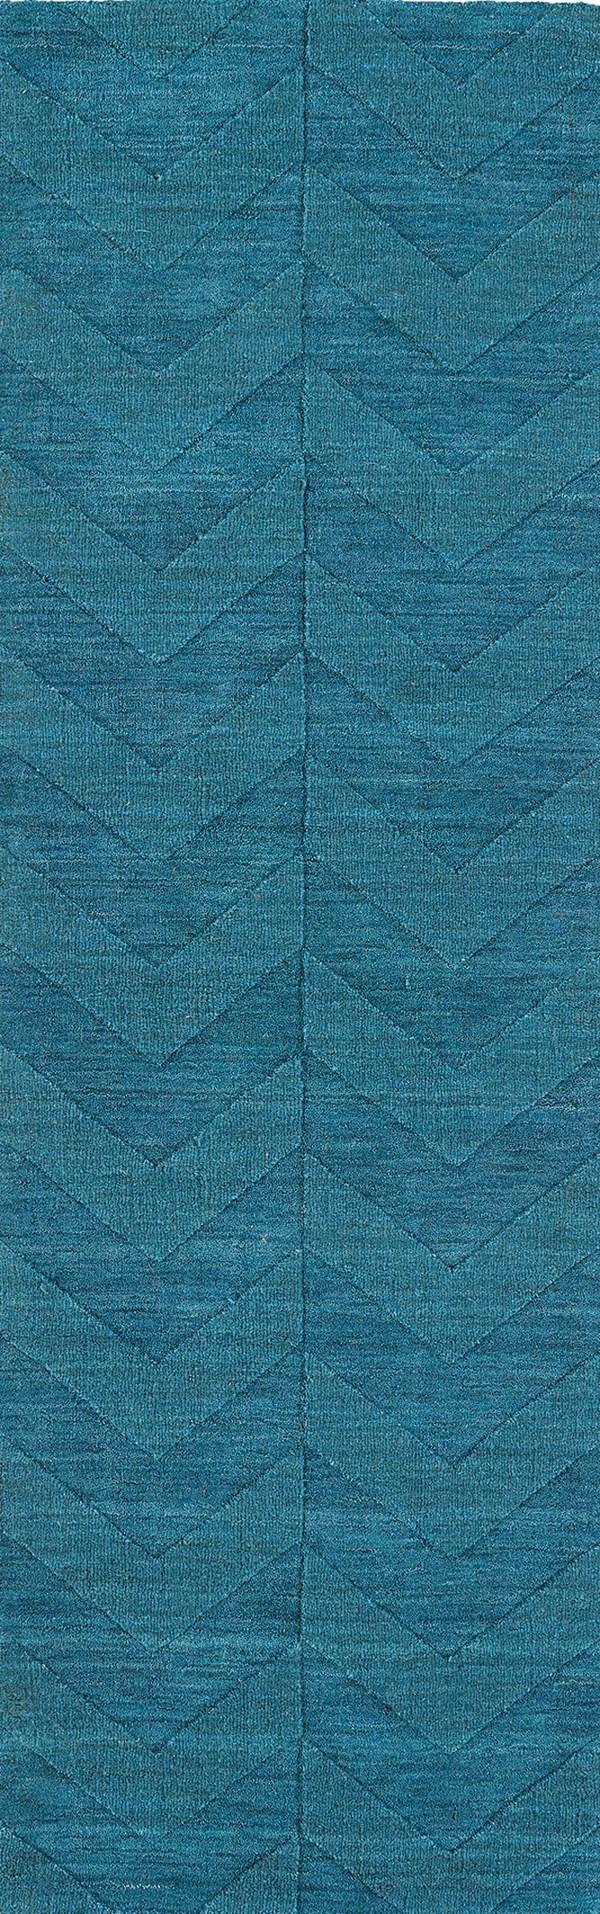 Turquoise (78) Chevron Area Rug